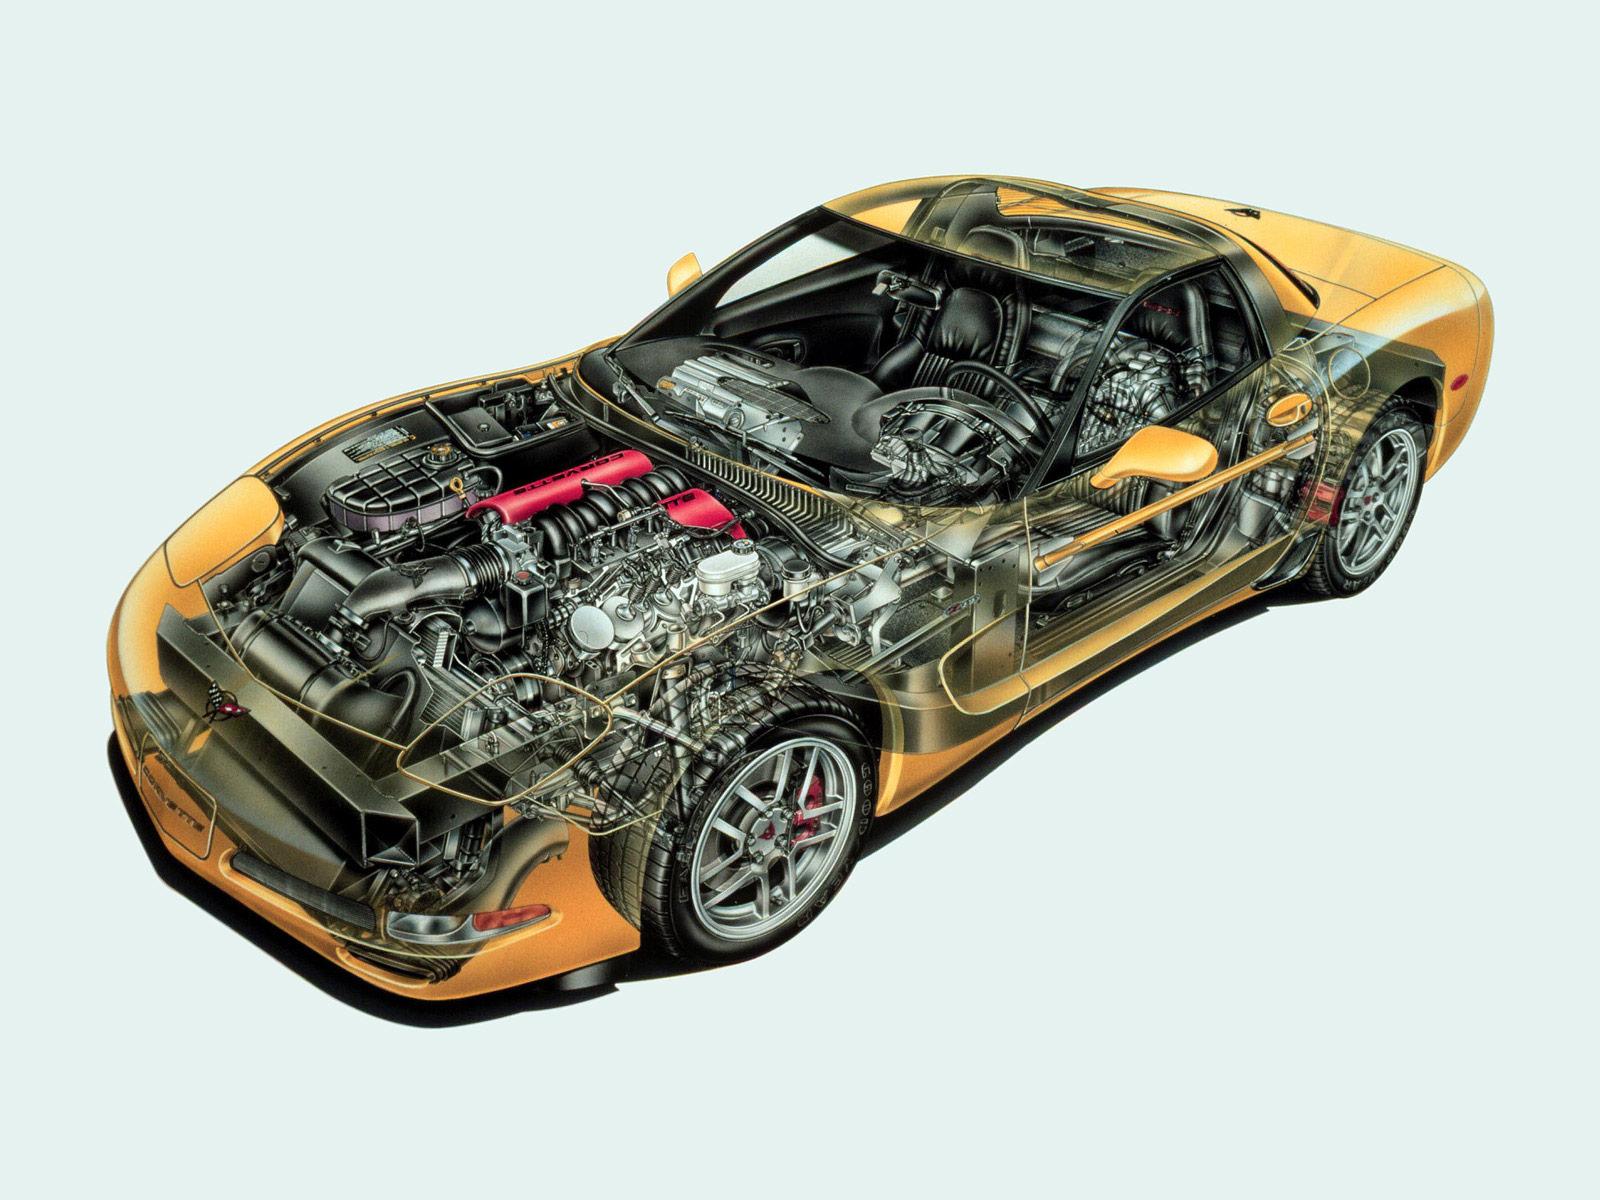 Chevrolet Corvette C5 cutaway